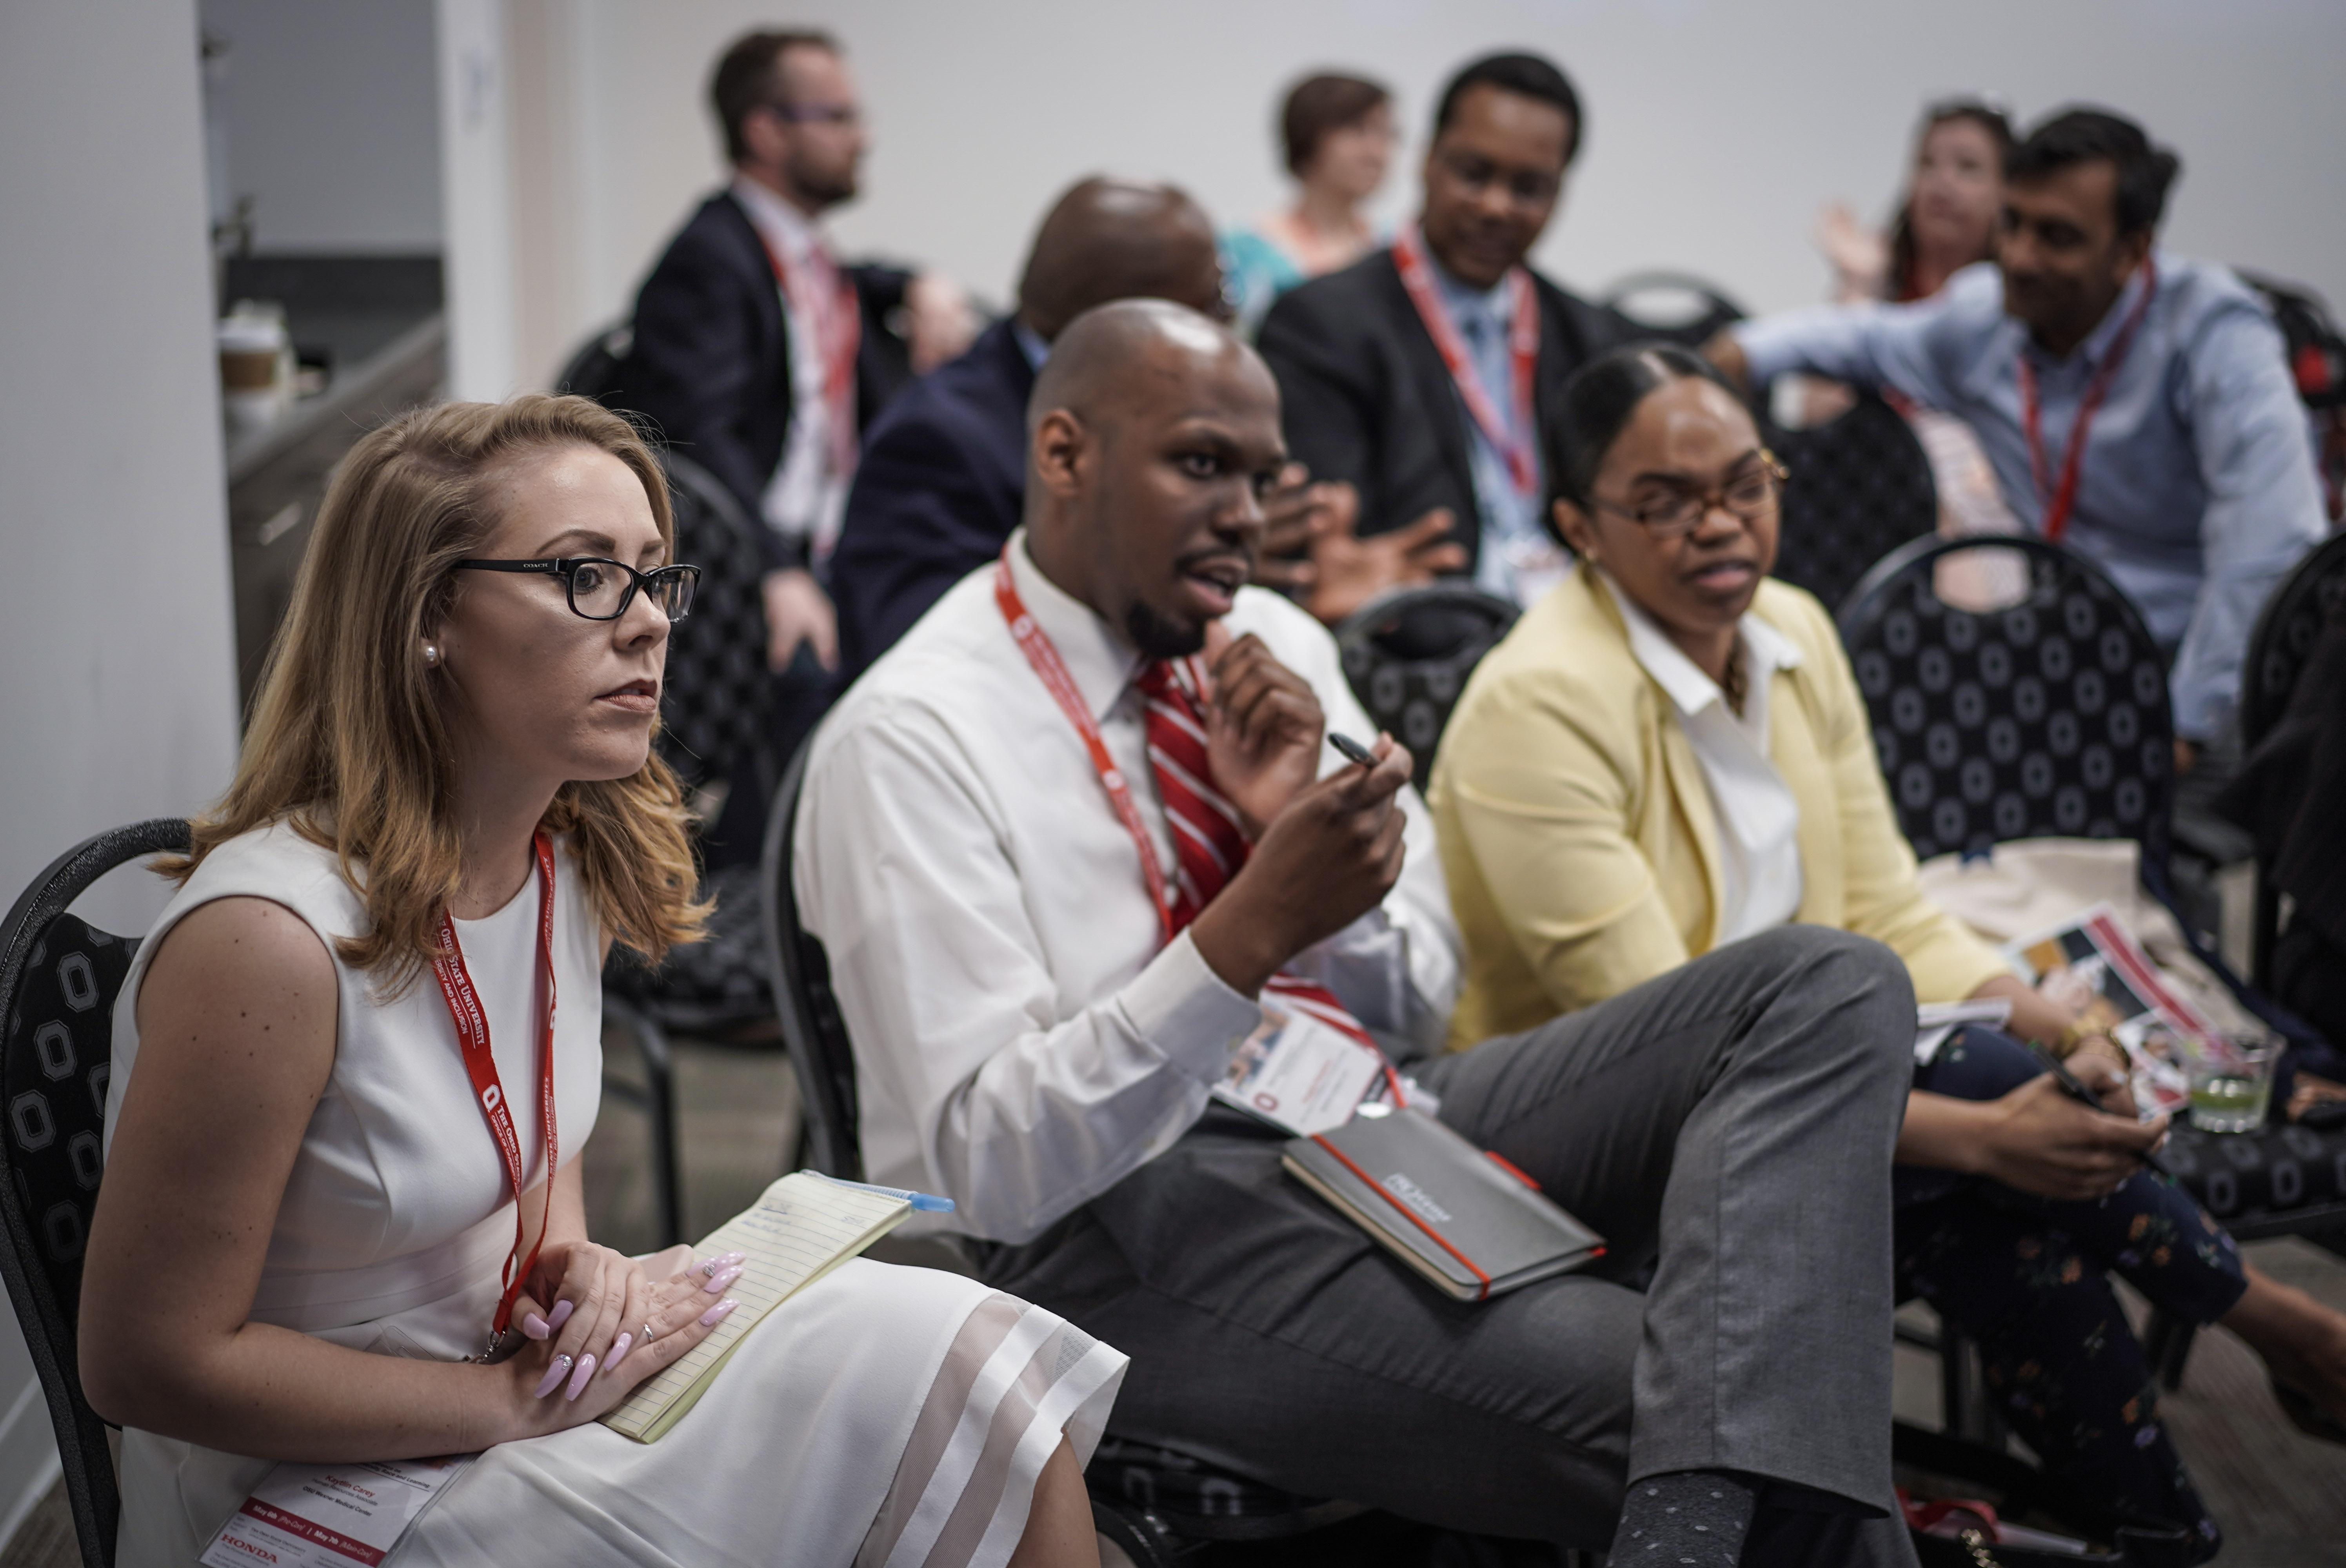 Participants listen to speaker